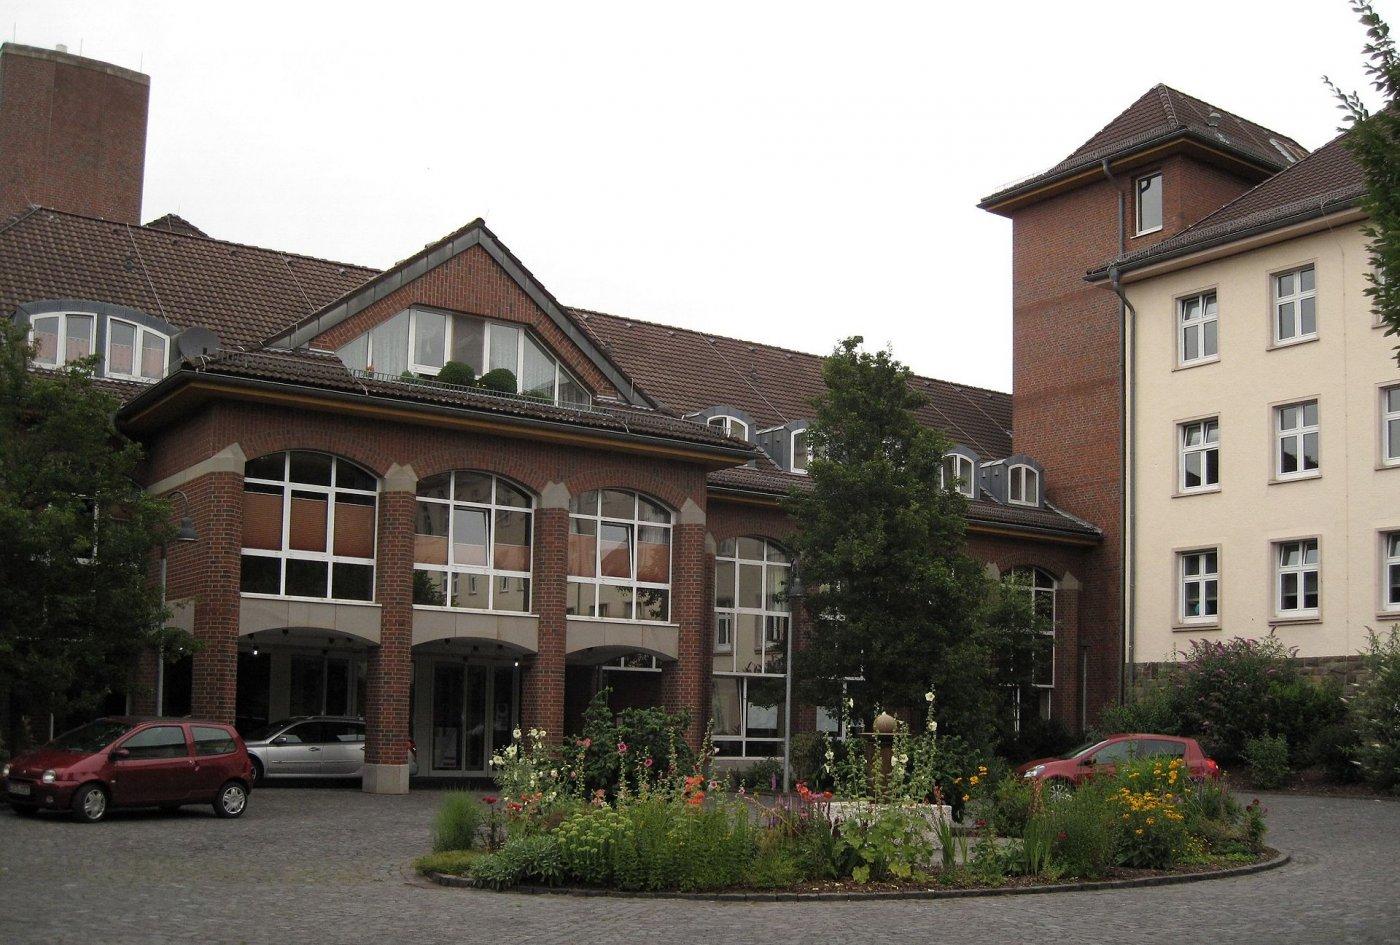 Фото Школа - интернат. Германия, Nordrhein-Westfalen, Iserlohn, Bismarckstrase, 15